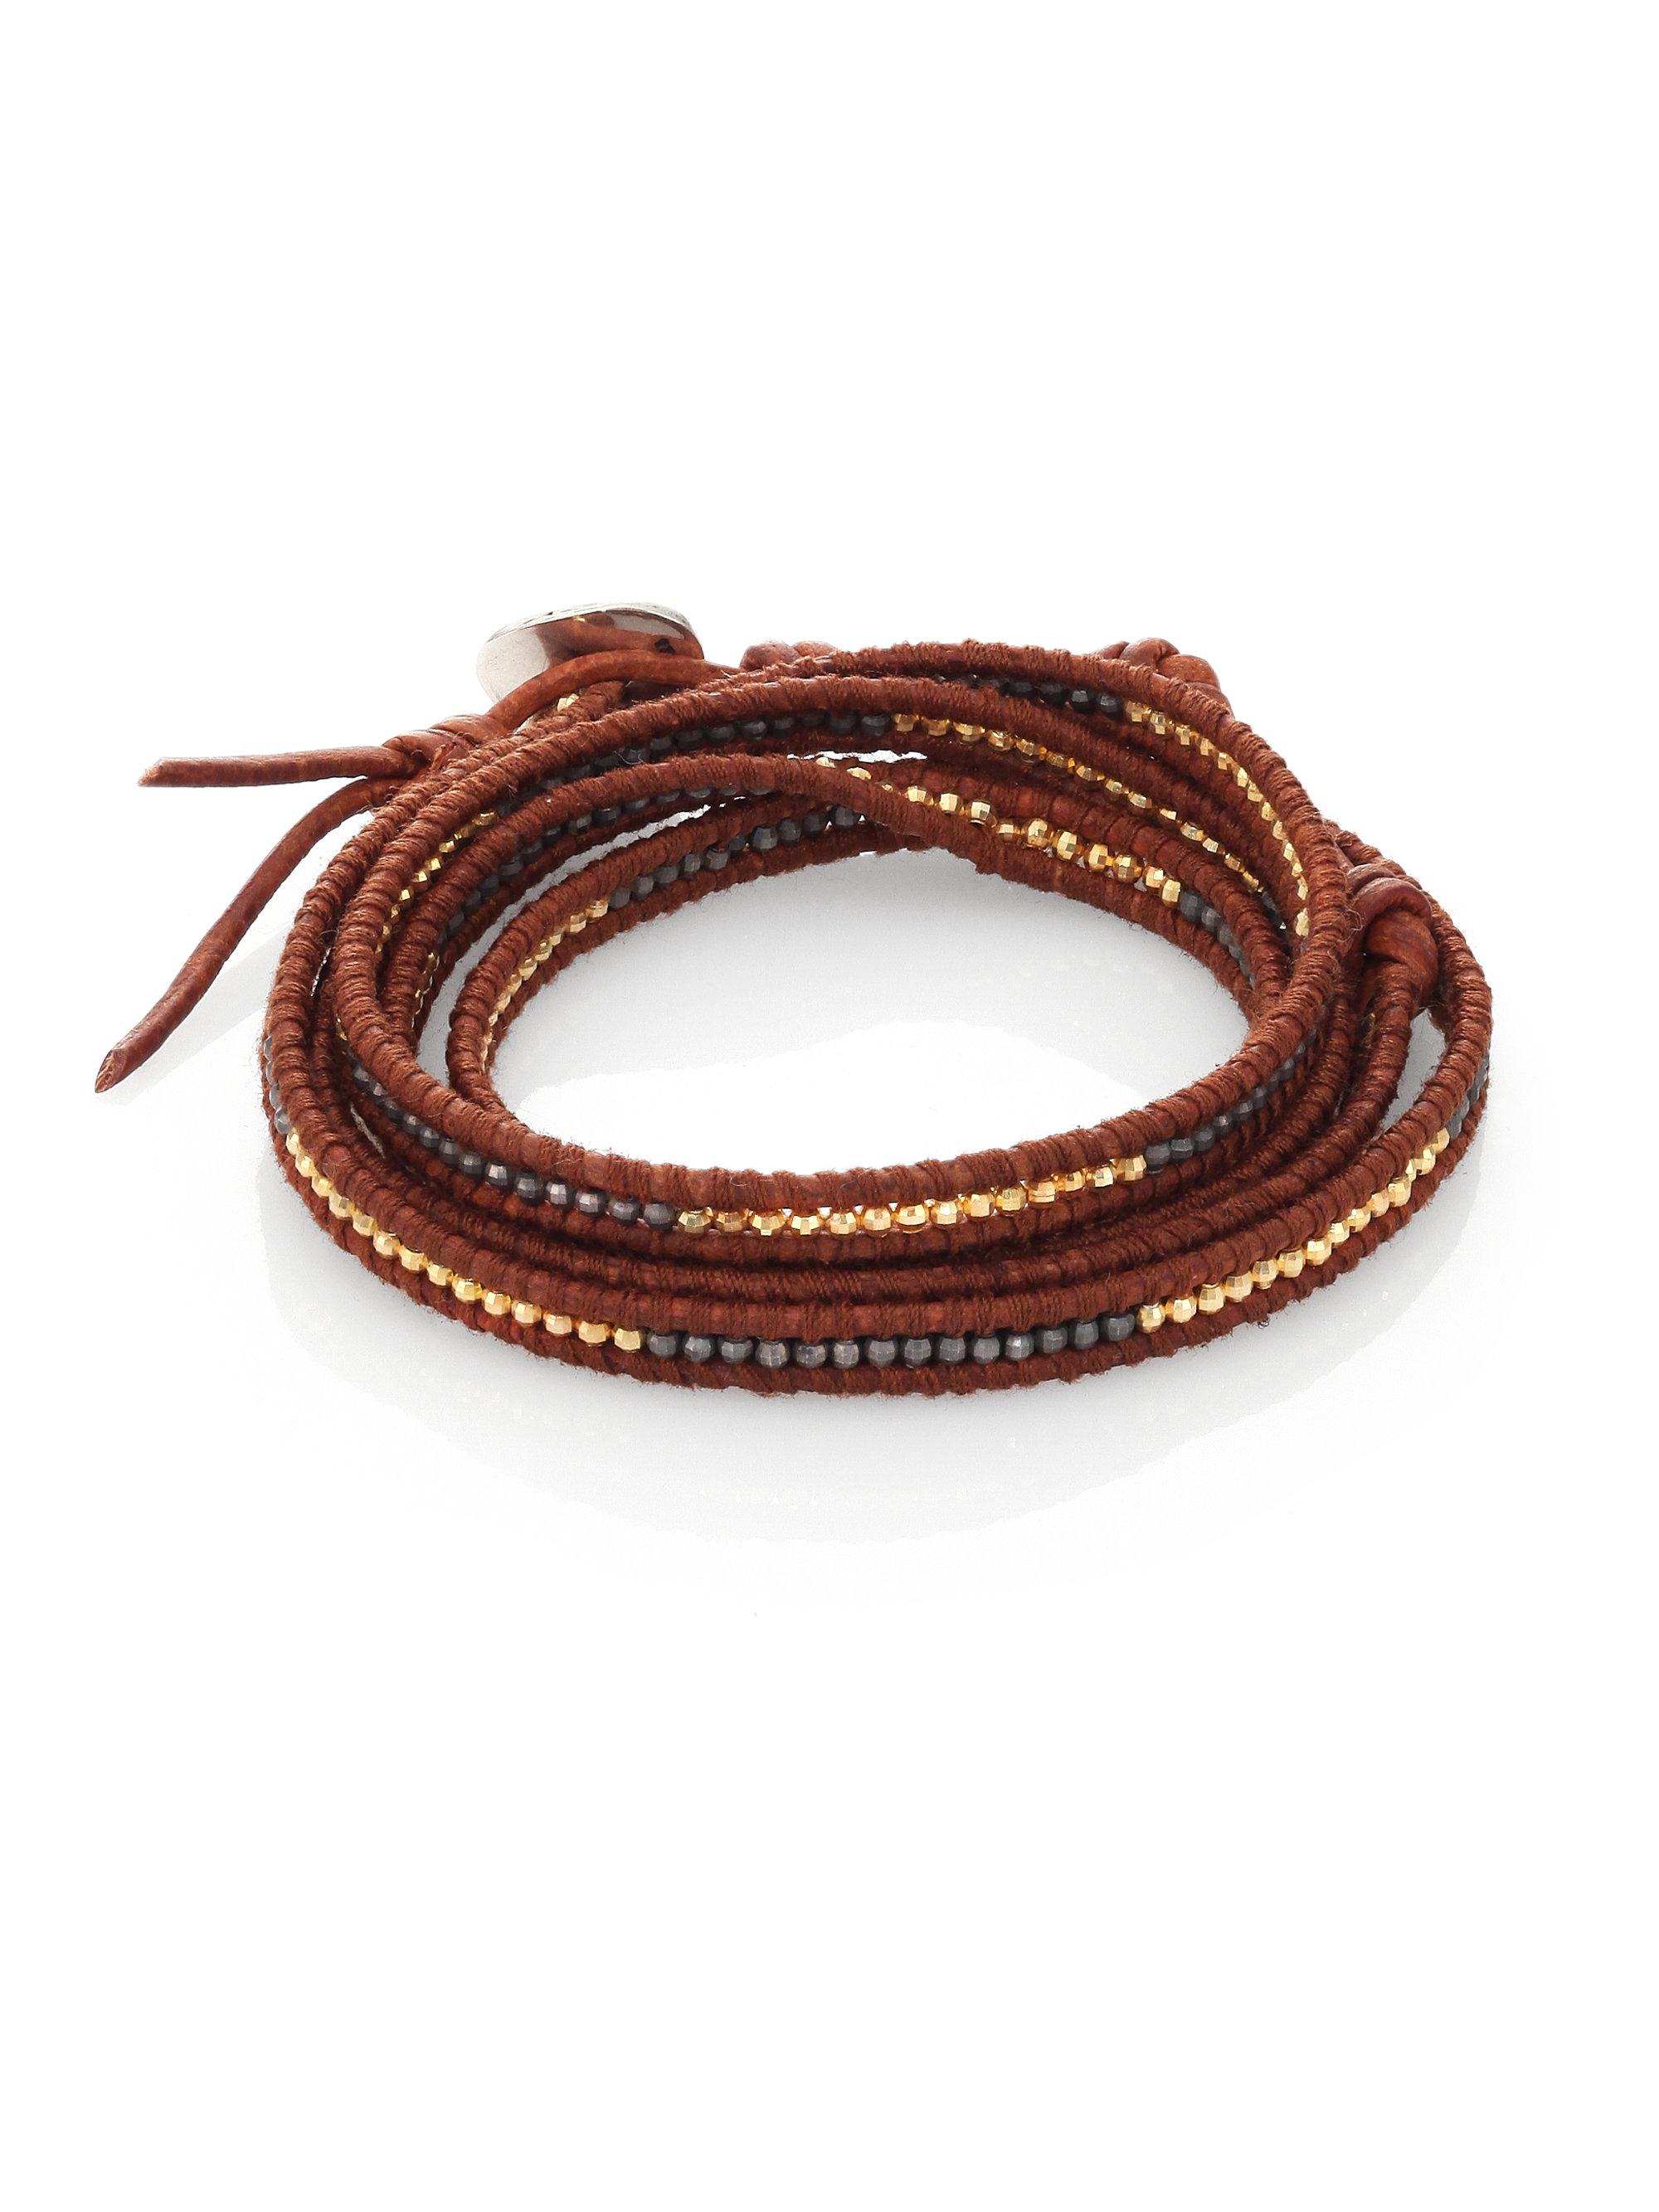 chan luu two tone beaded leather multi row wrap bracelet